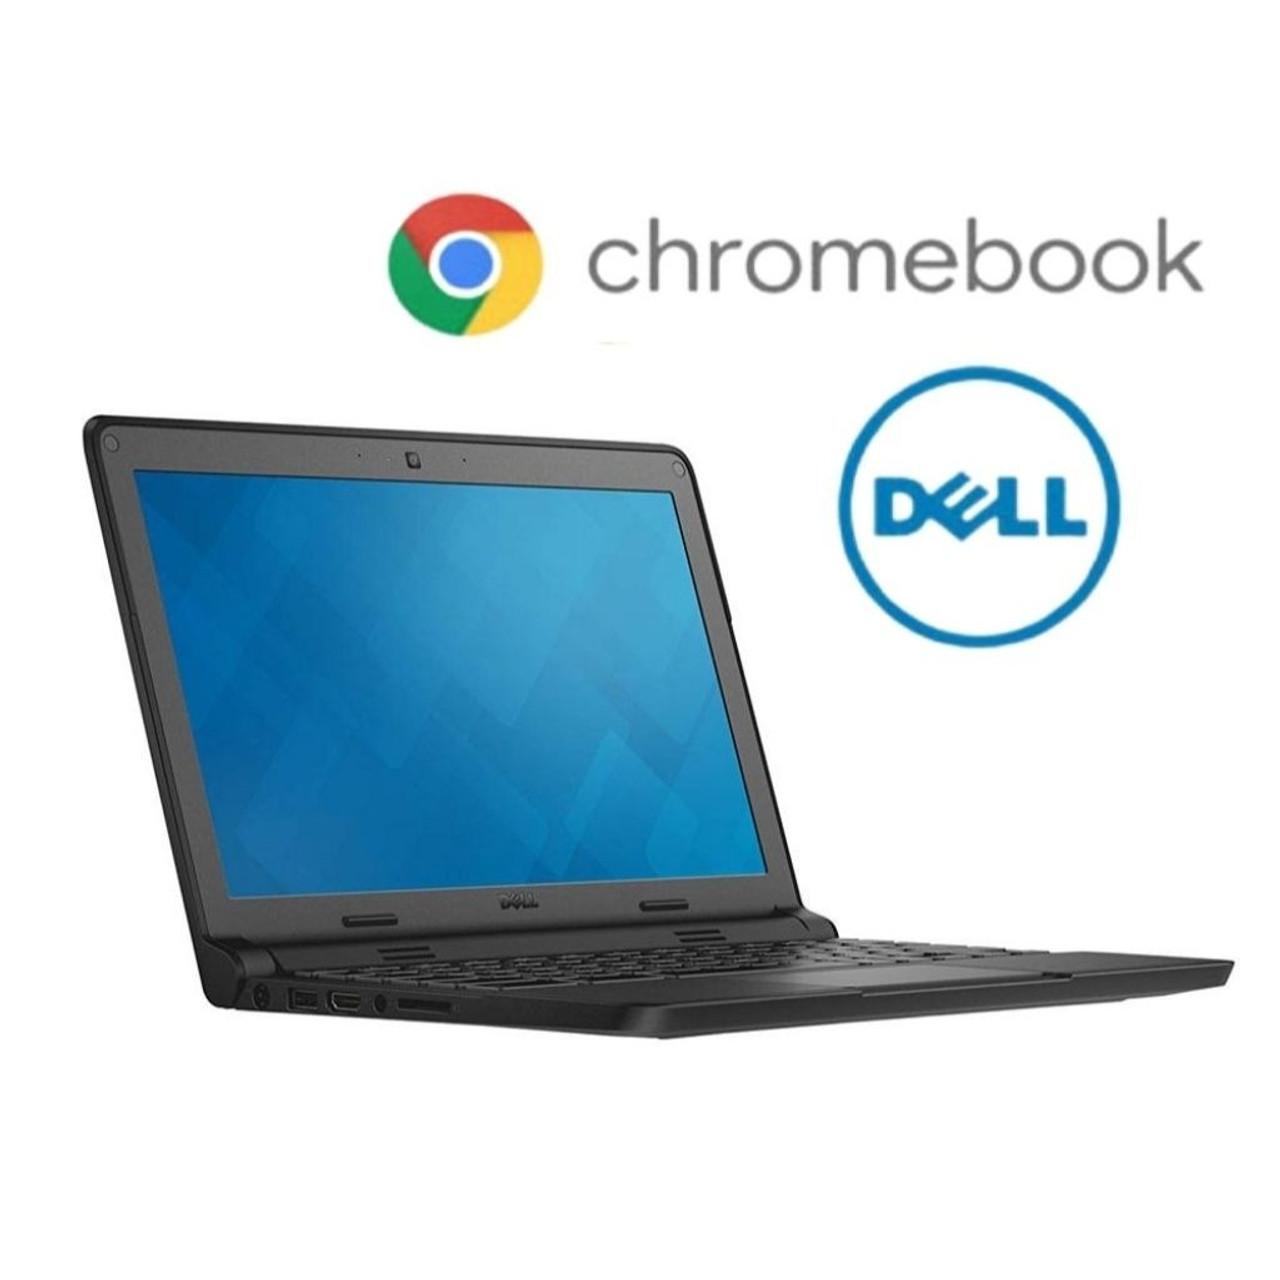 "Dell Chromebook 11.6"", Intel Dual-Core, 4GB Ram, 16GB eMMC, Chrome OS $89.99 (64% OFF)"